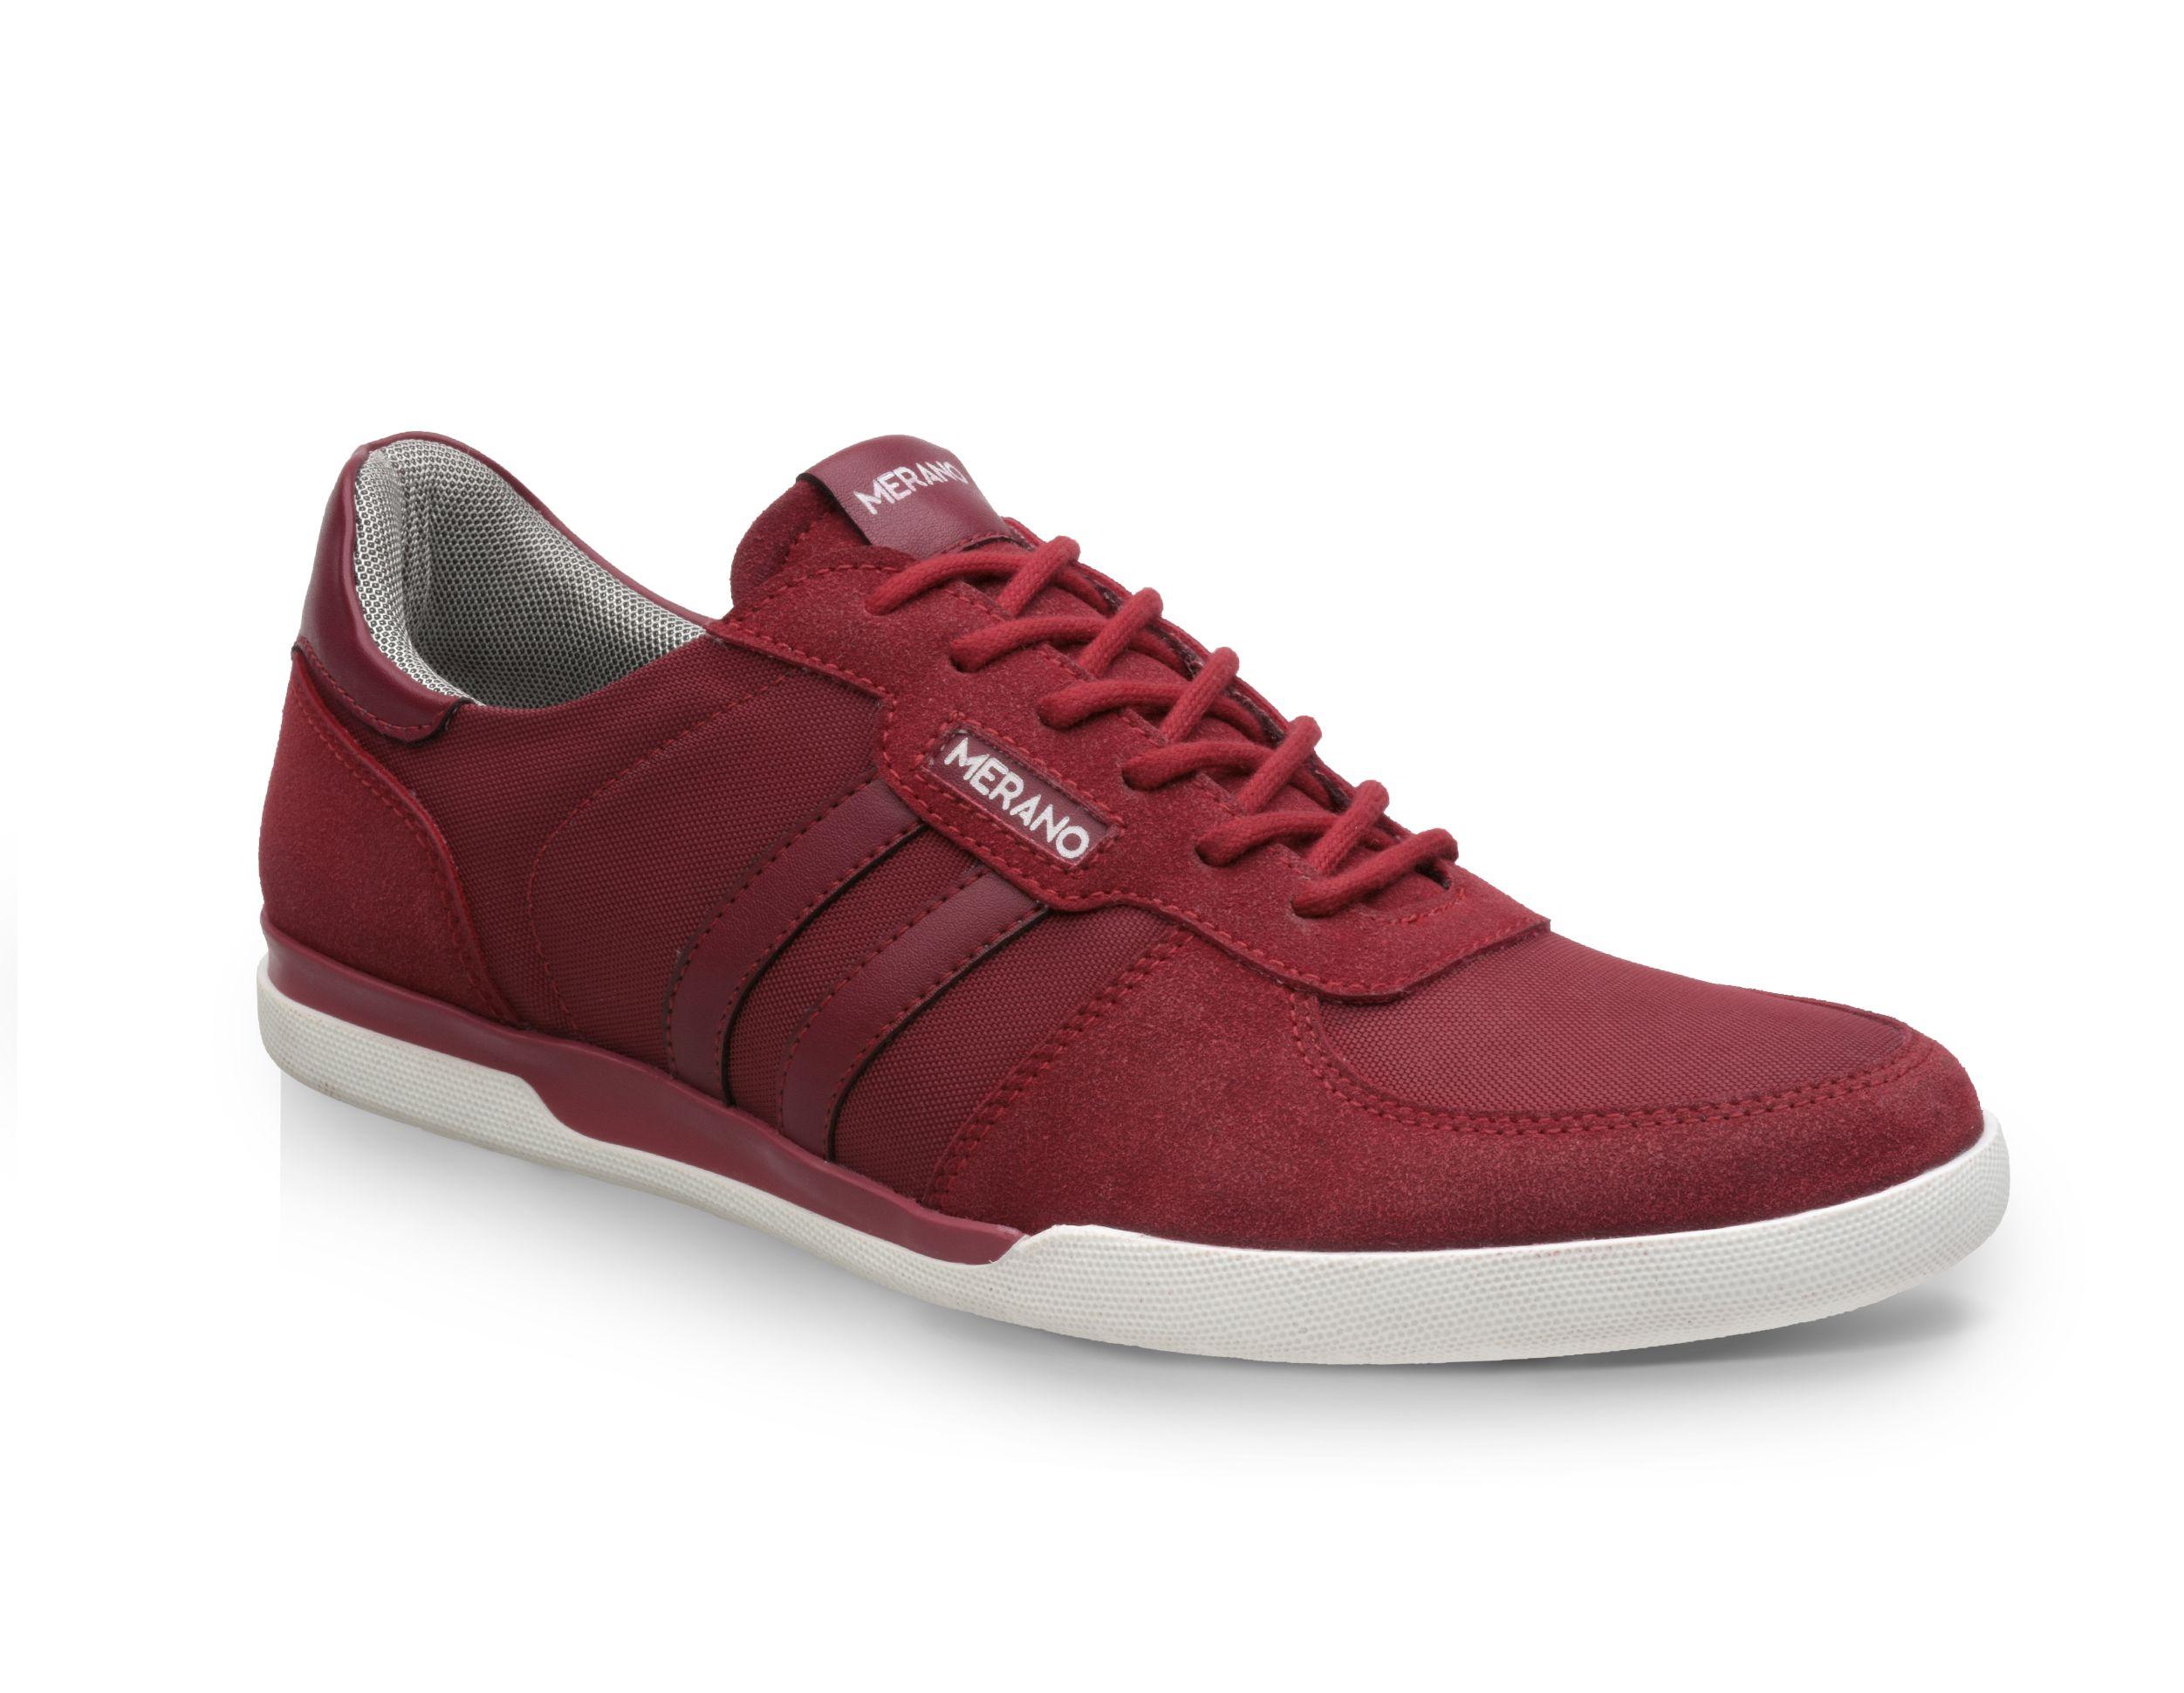 separation shoes 9aa75 877eb MERANO CHOCLO APOLO Zapatos Casuales, Calzado, Zapatillas